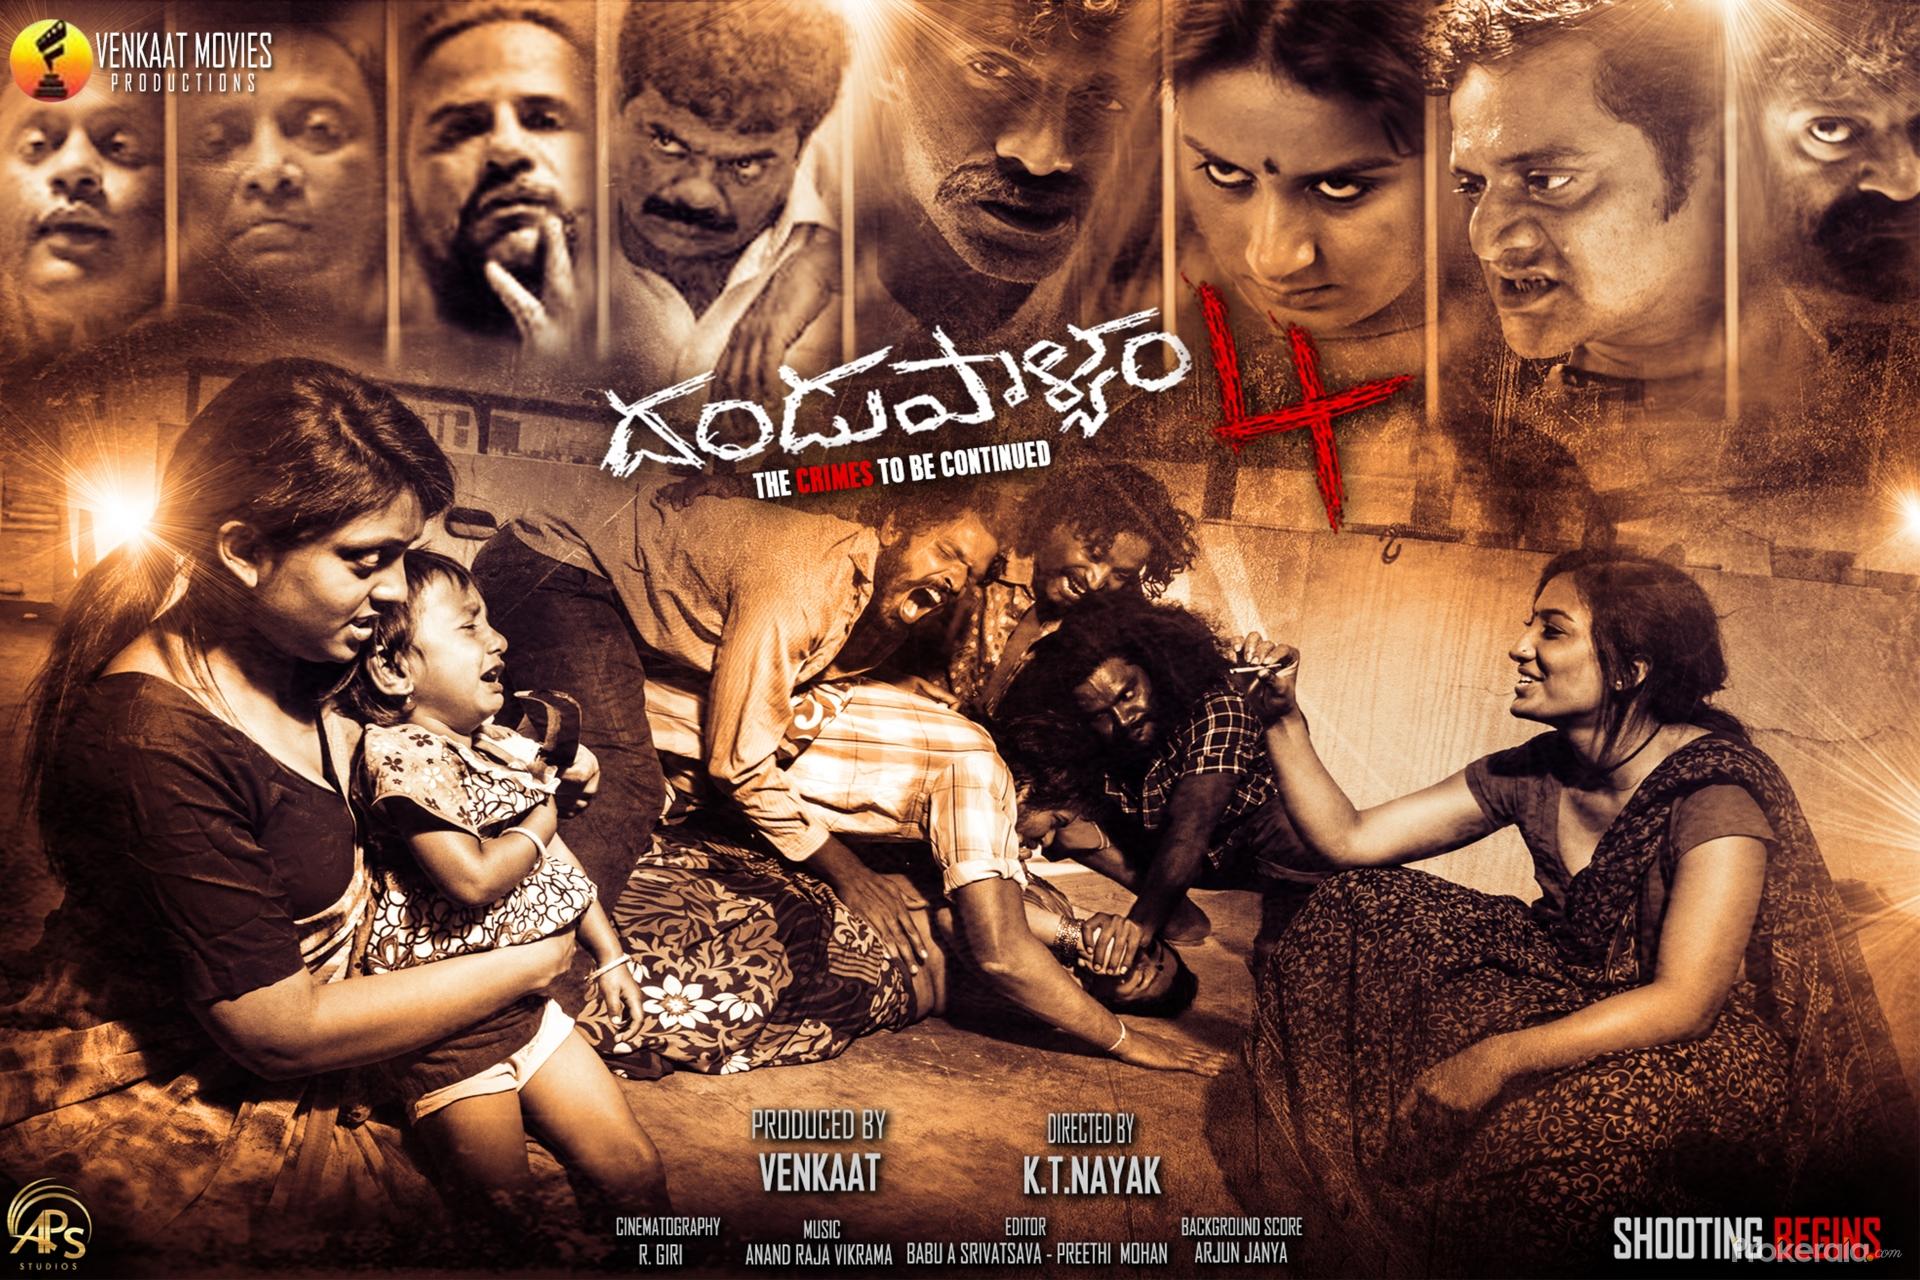 Dandupalyam 4 Release In 5 Indian languages